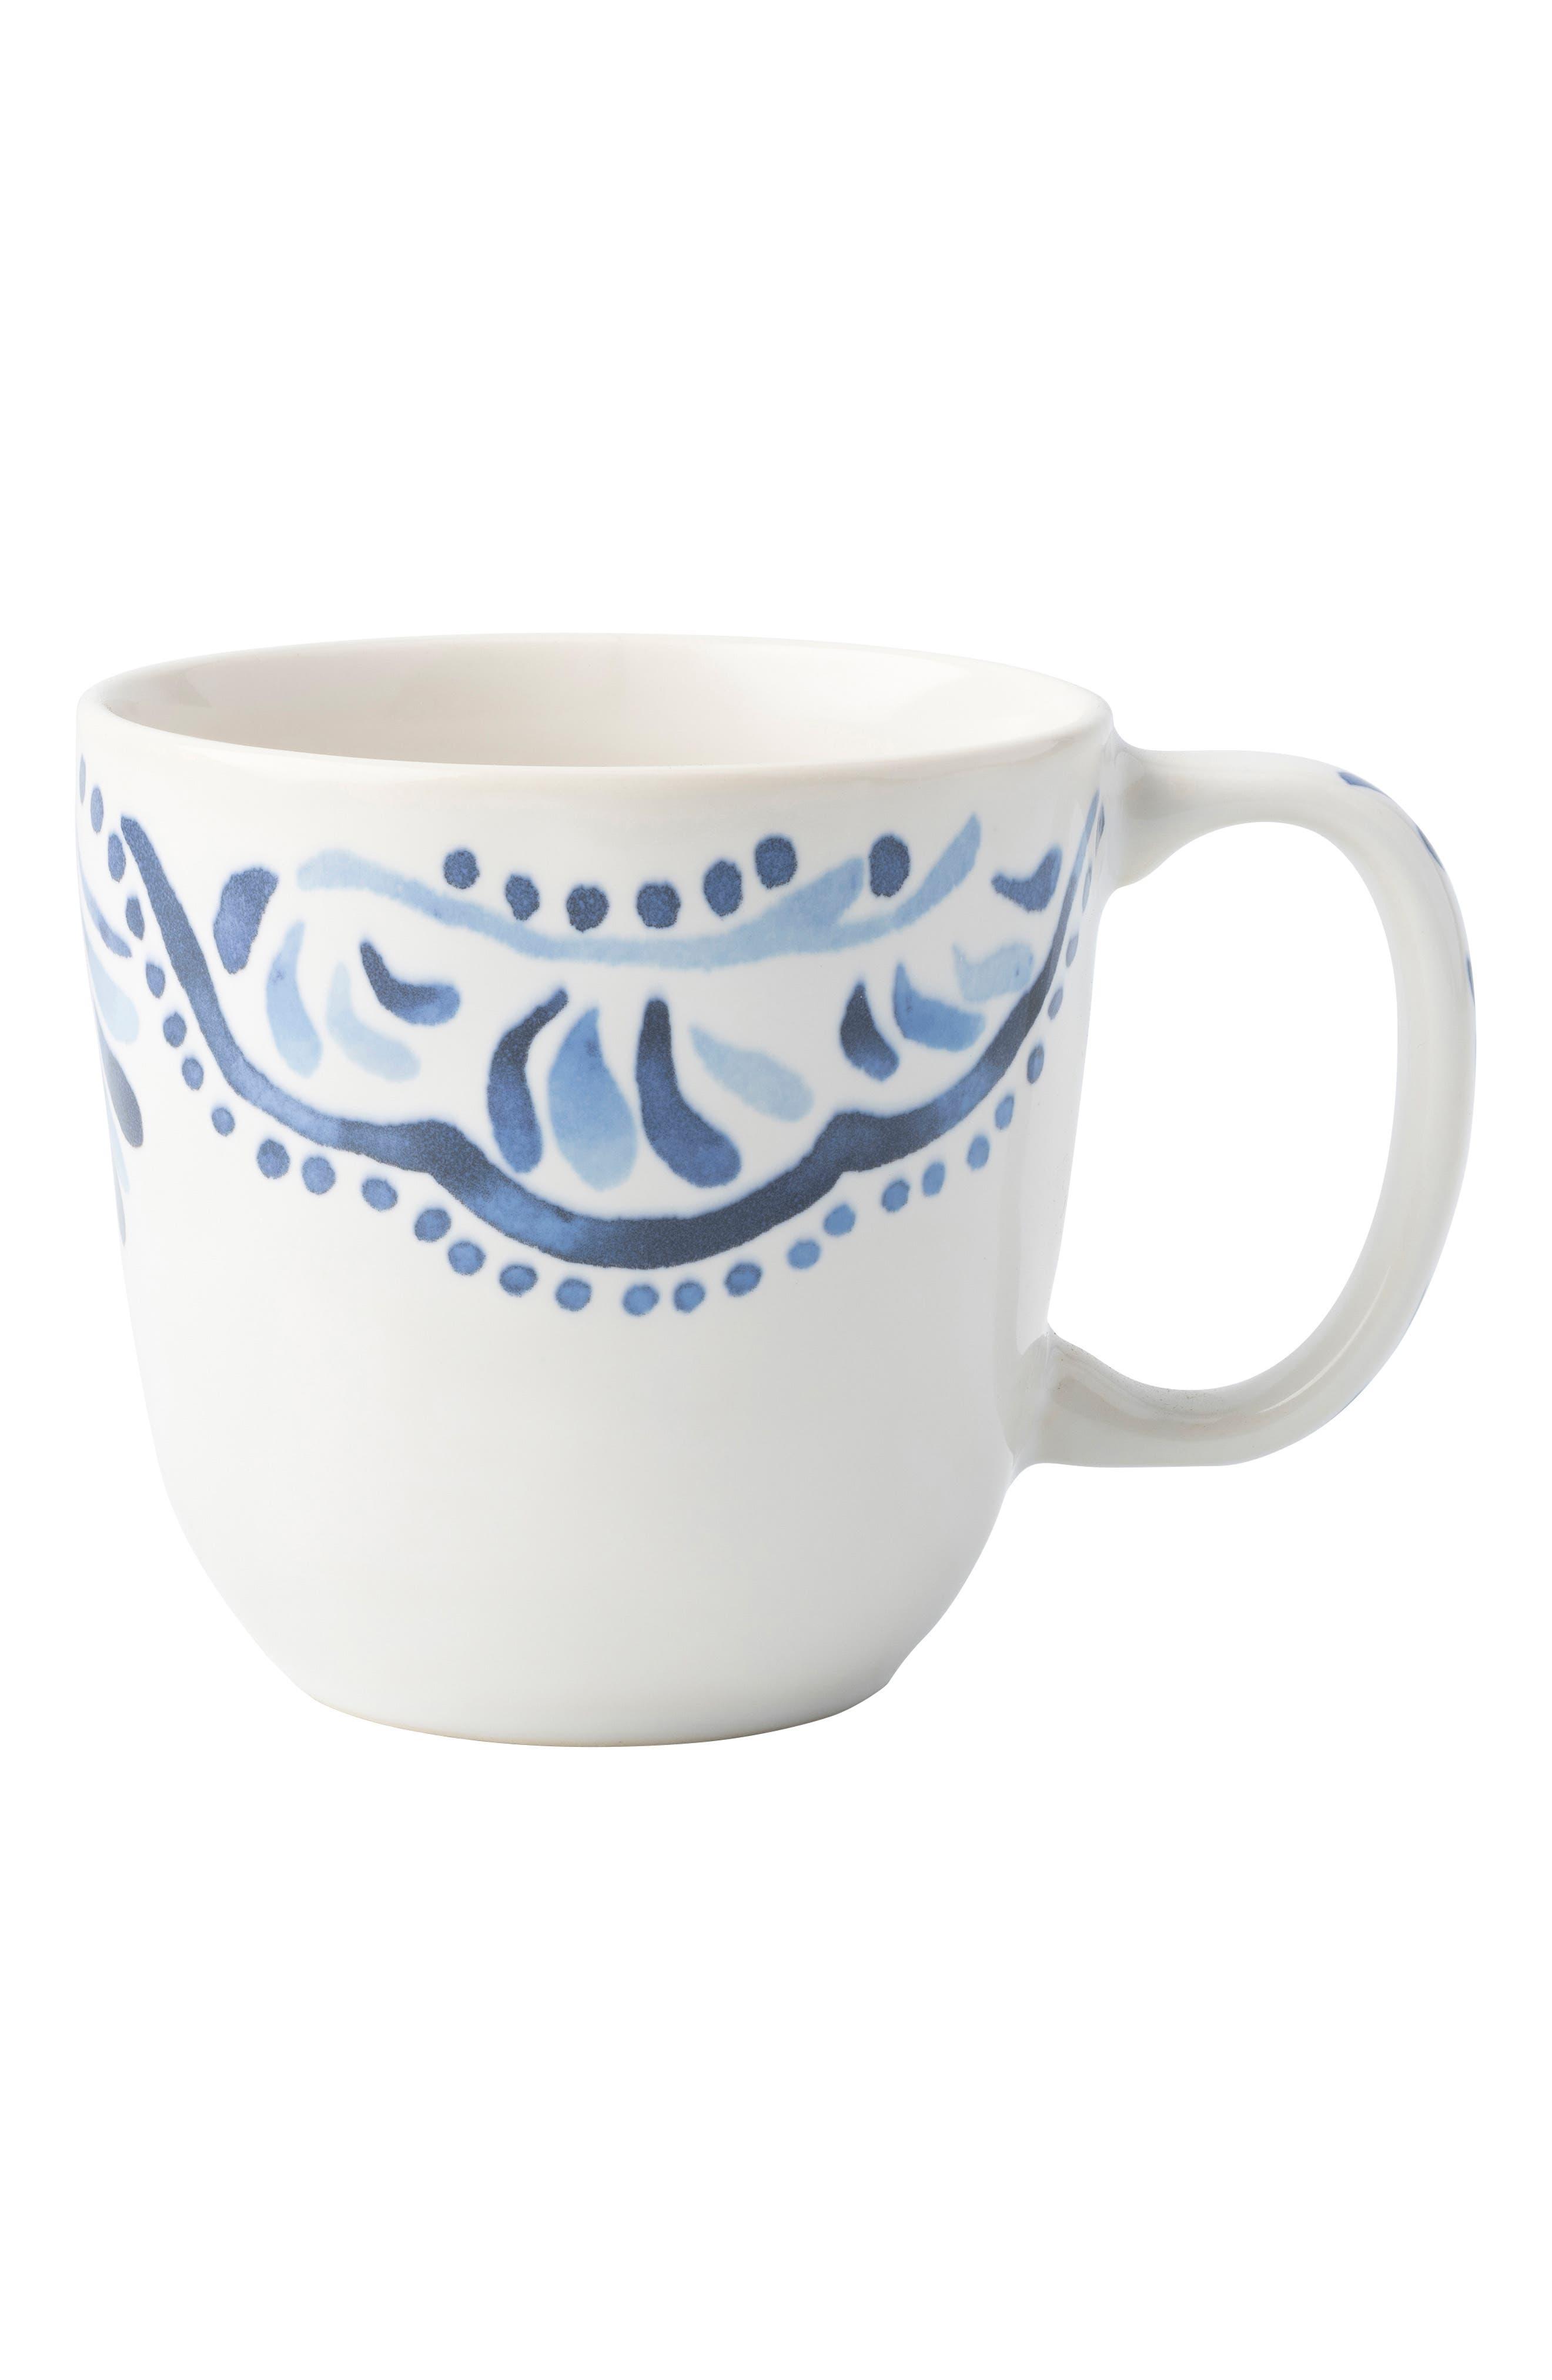 Wanderlust Collection - Iberian Journey Ceramic Coffee/Tea Cup,                             Main thumbnail 1, color,                             INDIGO